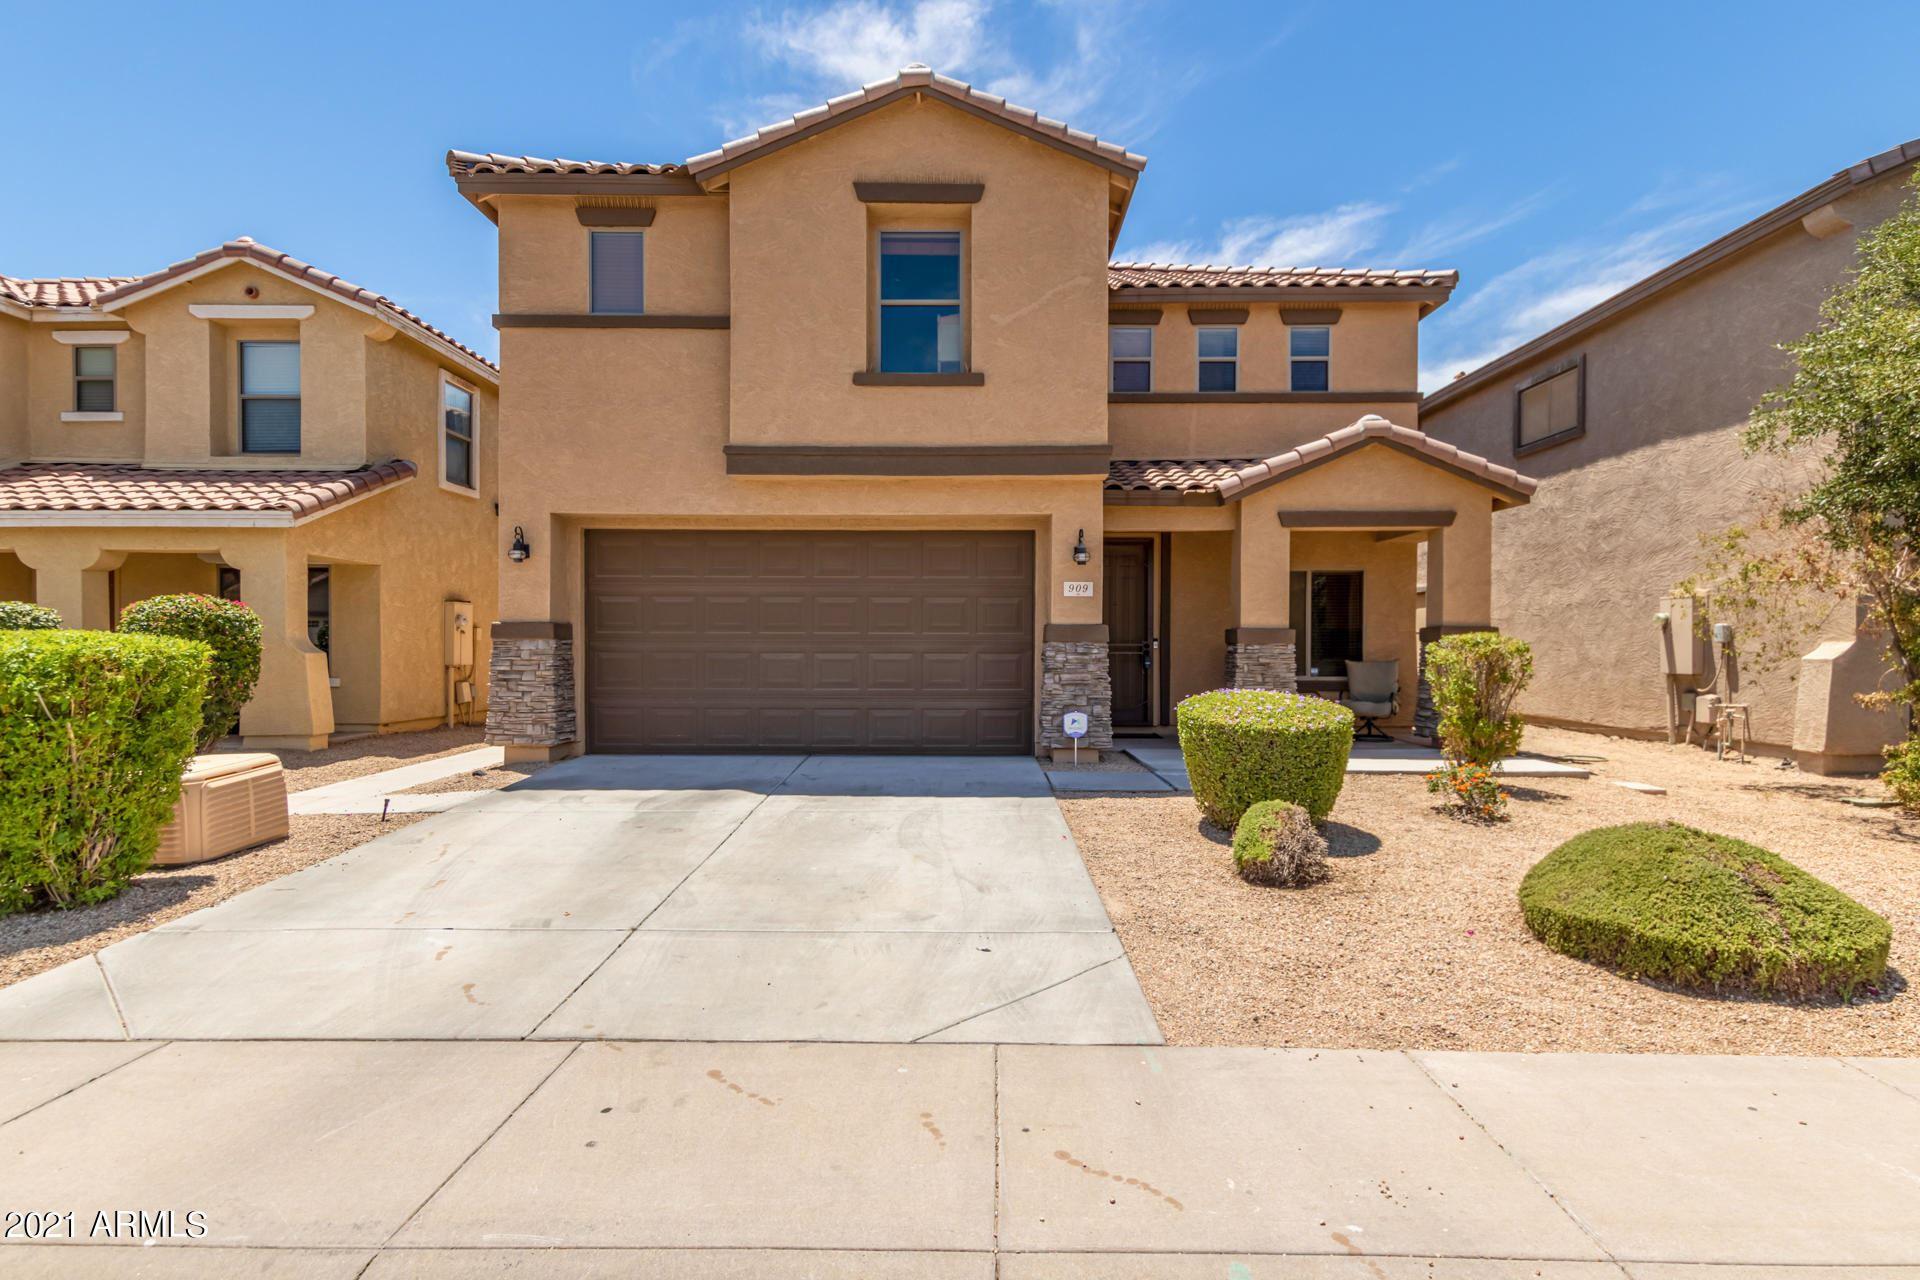 Photo of 909 E CORRALL Street, Avondale, AZ 85323 (MLS # 6246514)